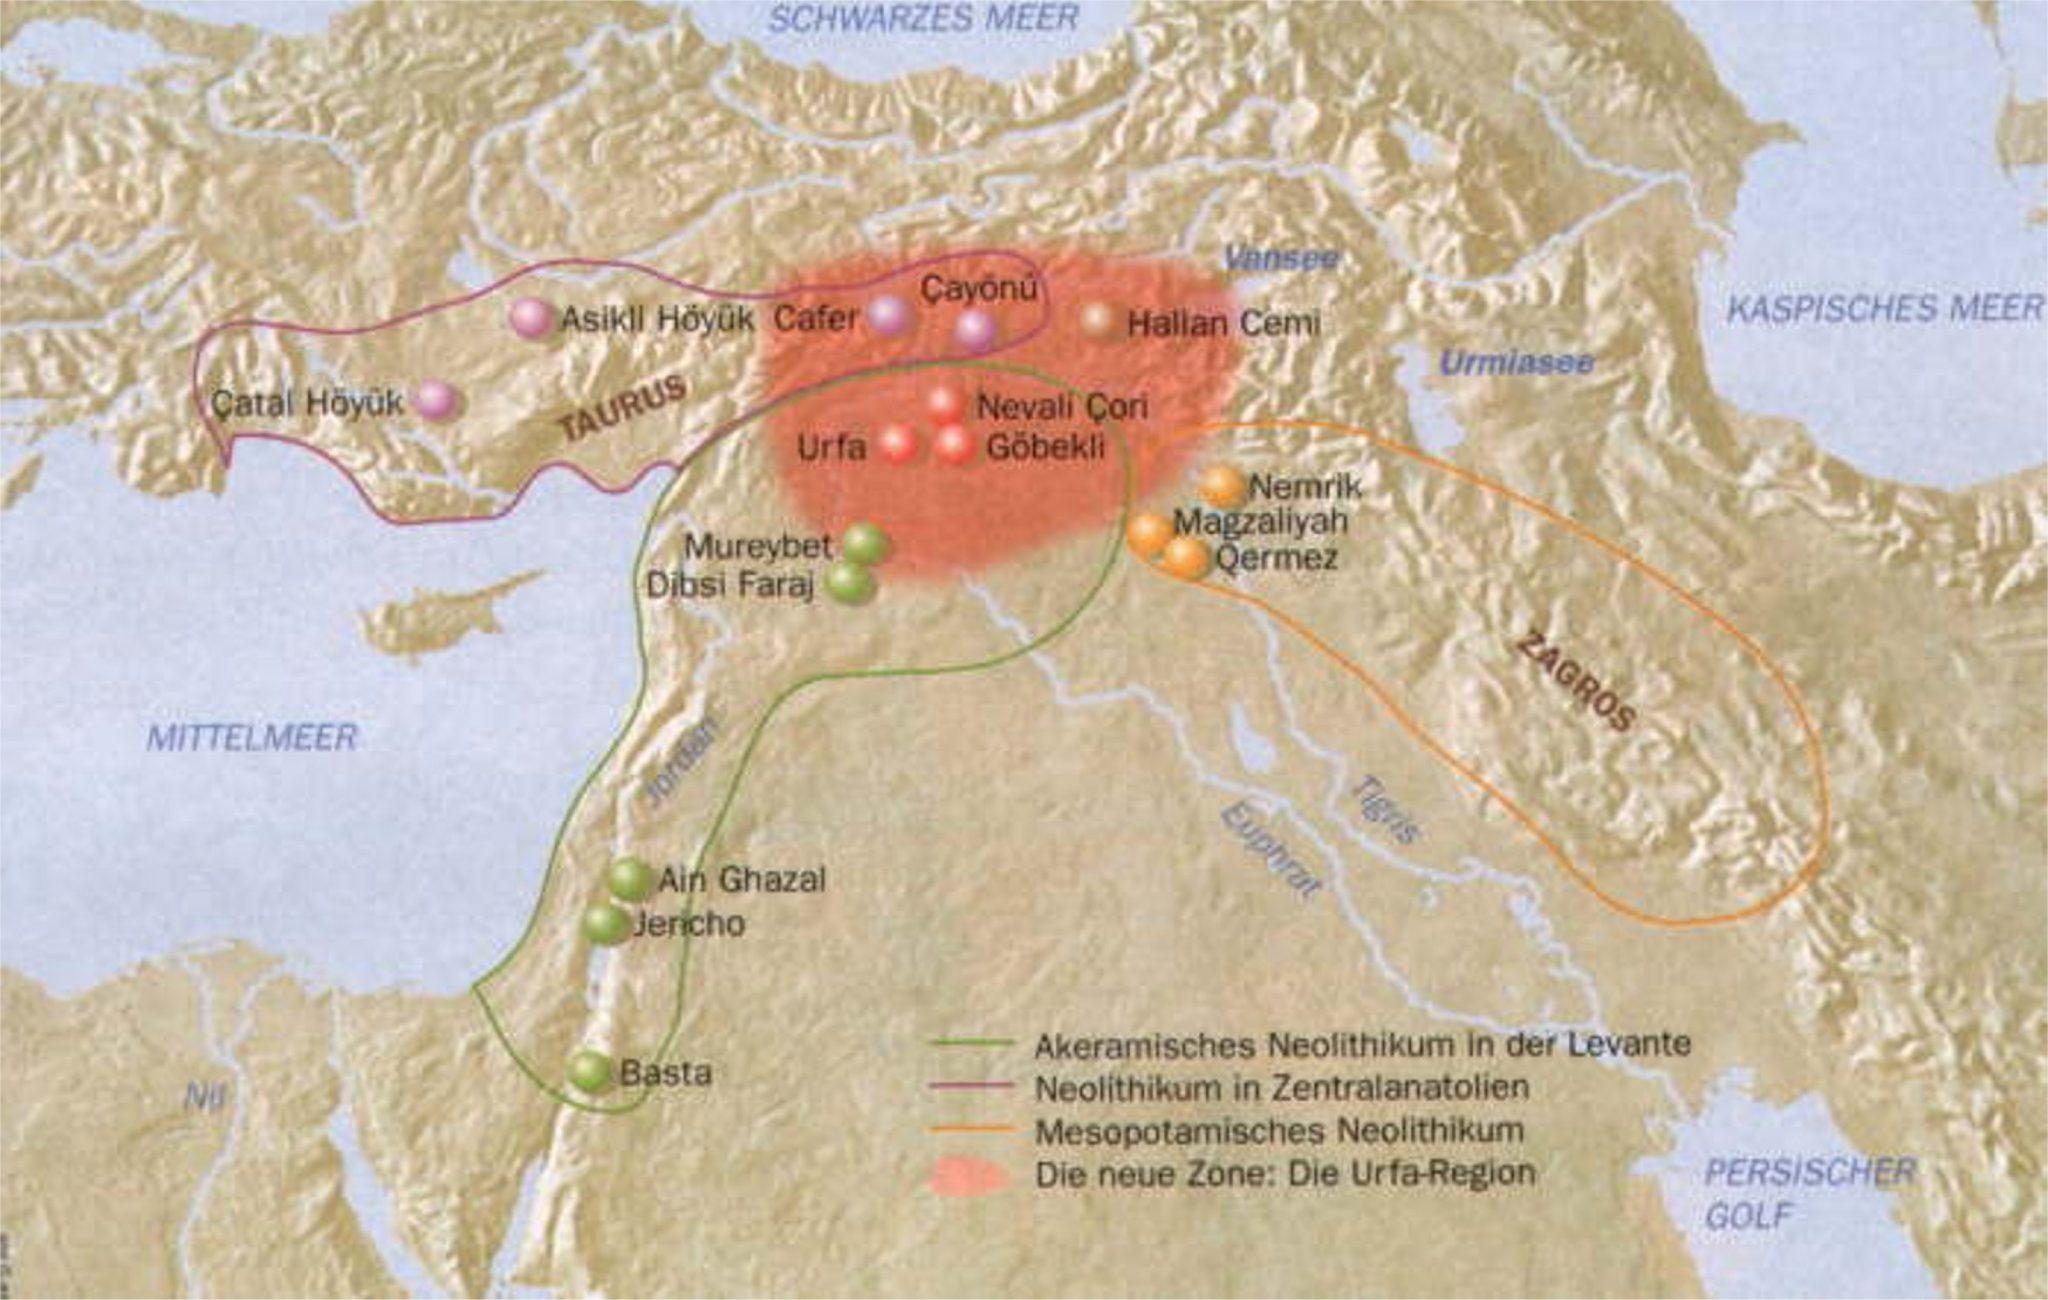 db_GobekliTepe_Urfa-Region9Alevi yol cem erkanı reformu Alevilik aleviler Devrimci Aleviler birliği DAB Pir sultan bektaşi.avi